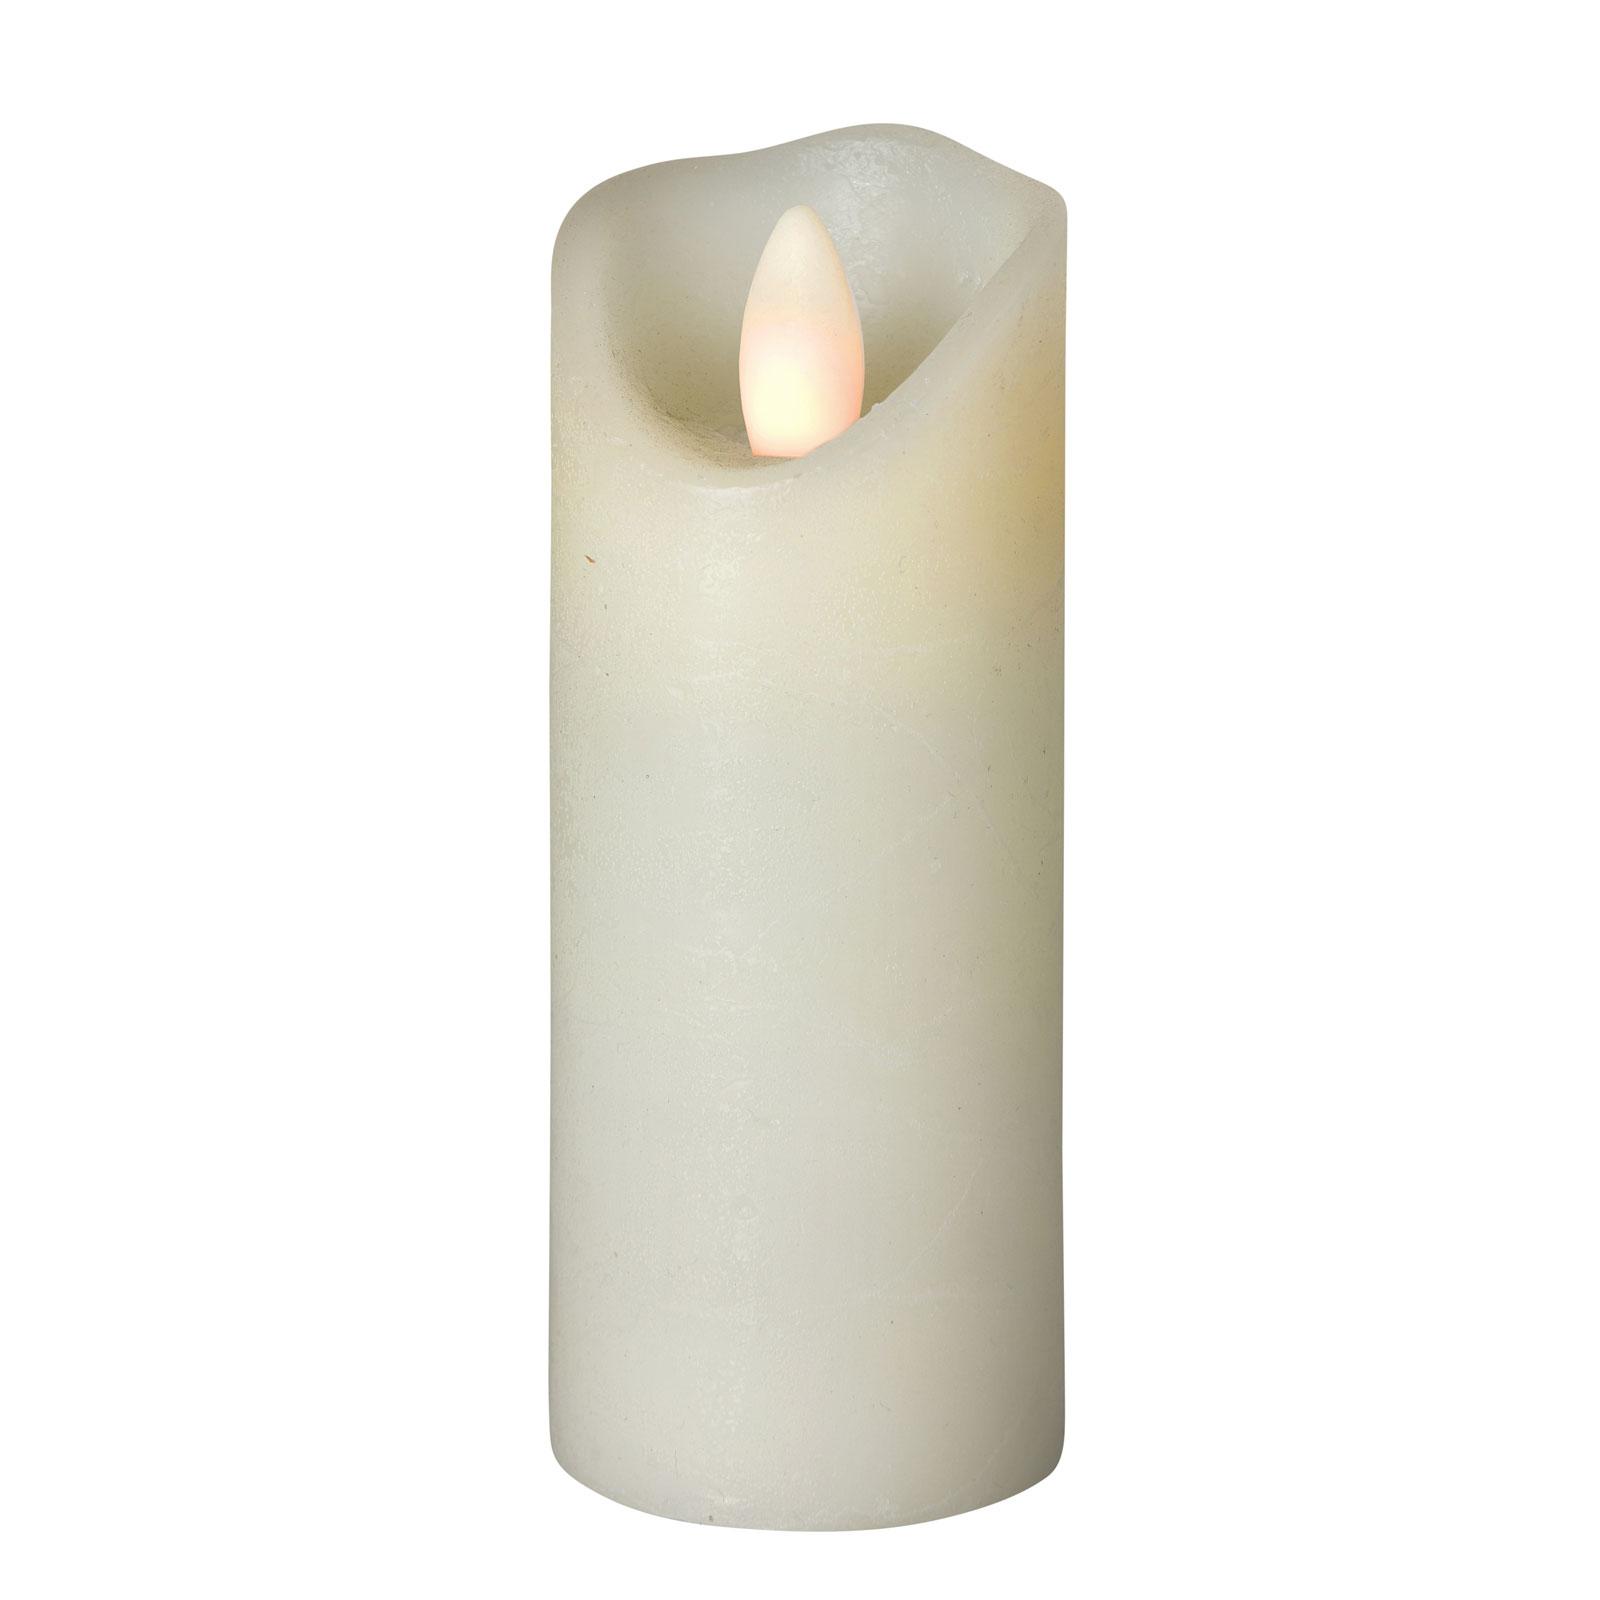 Shine LED-lys, Ø 5 cm, elfenben, højde 15 cm